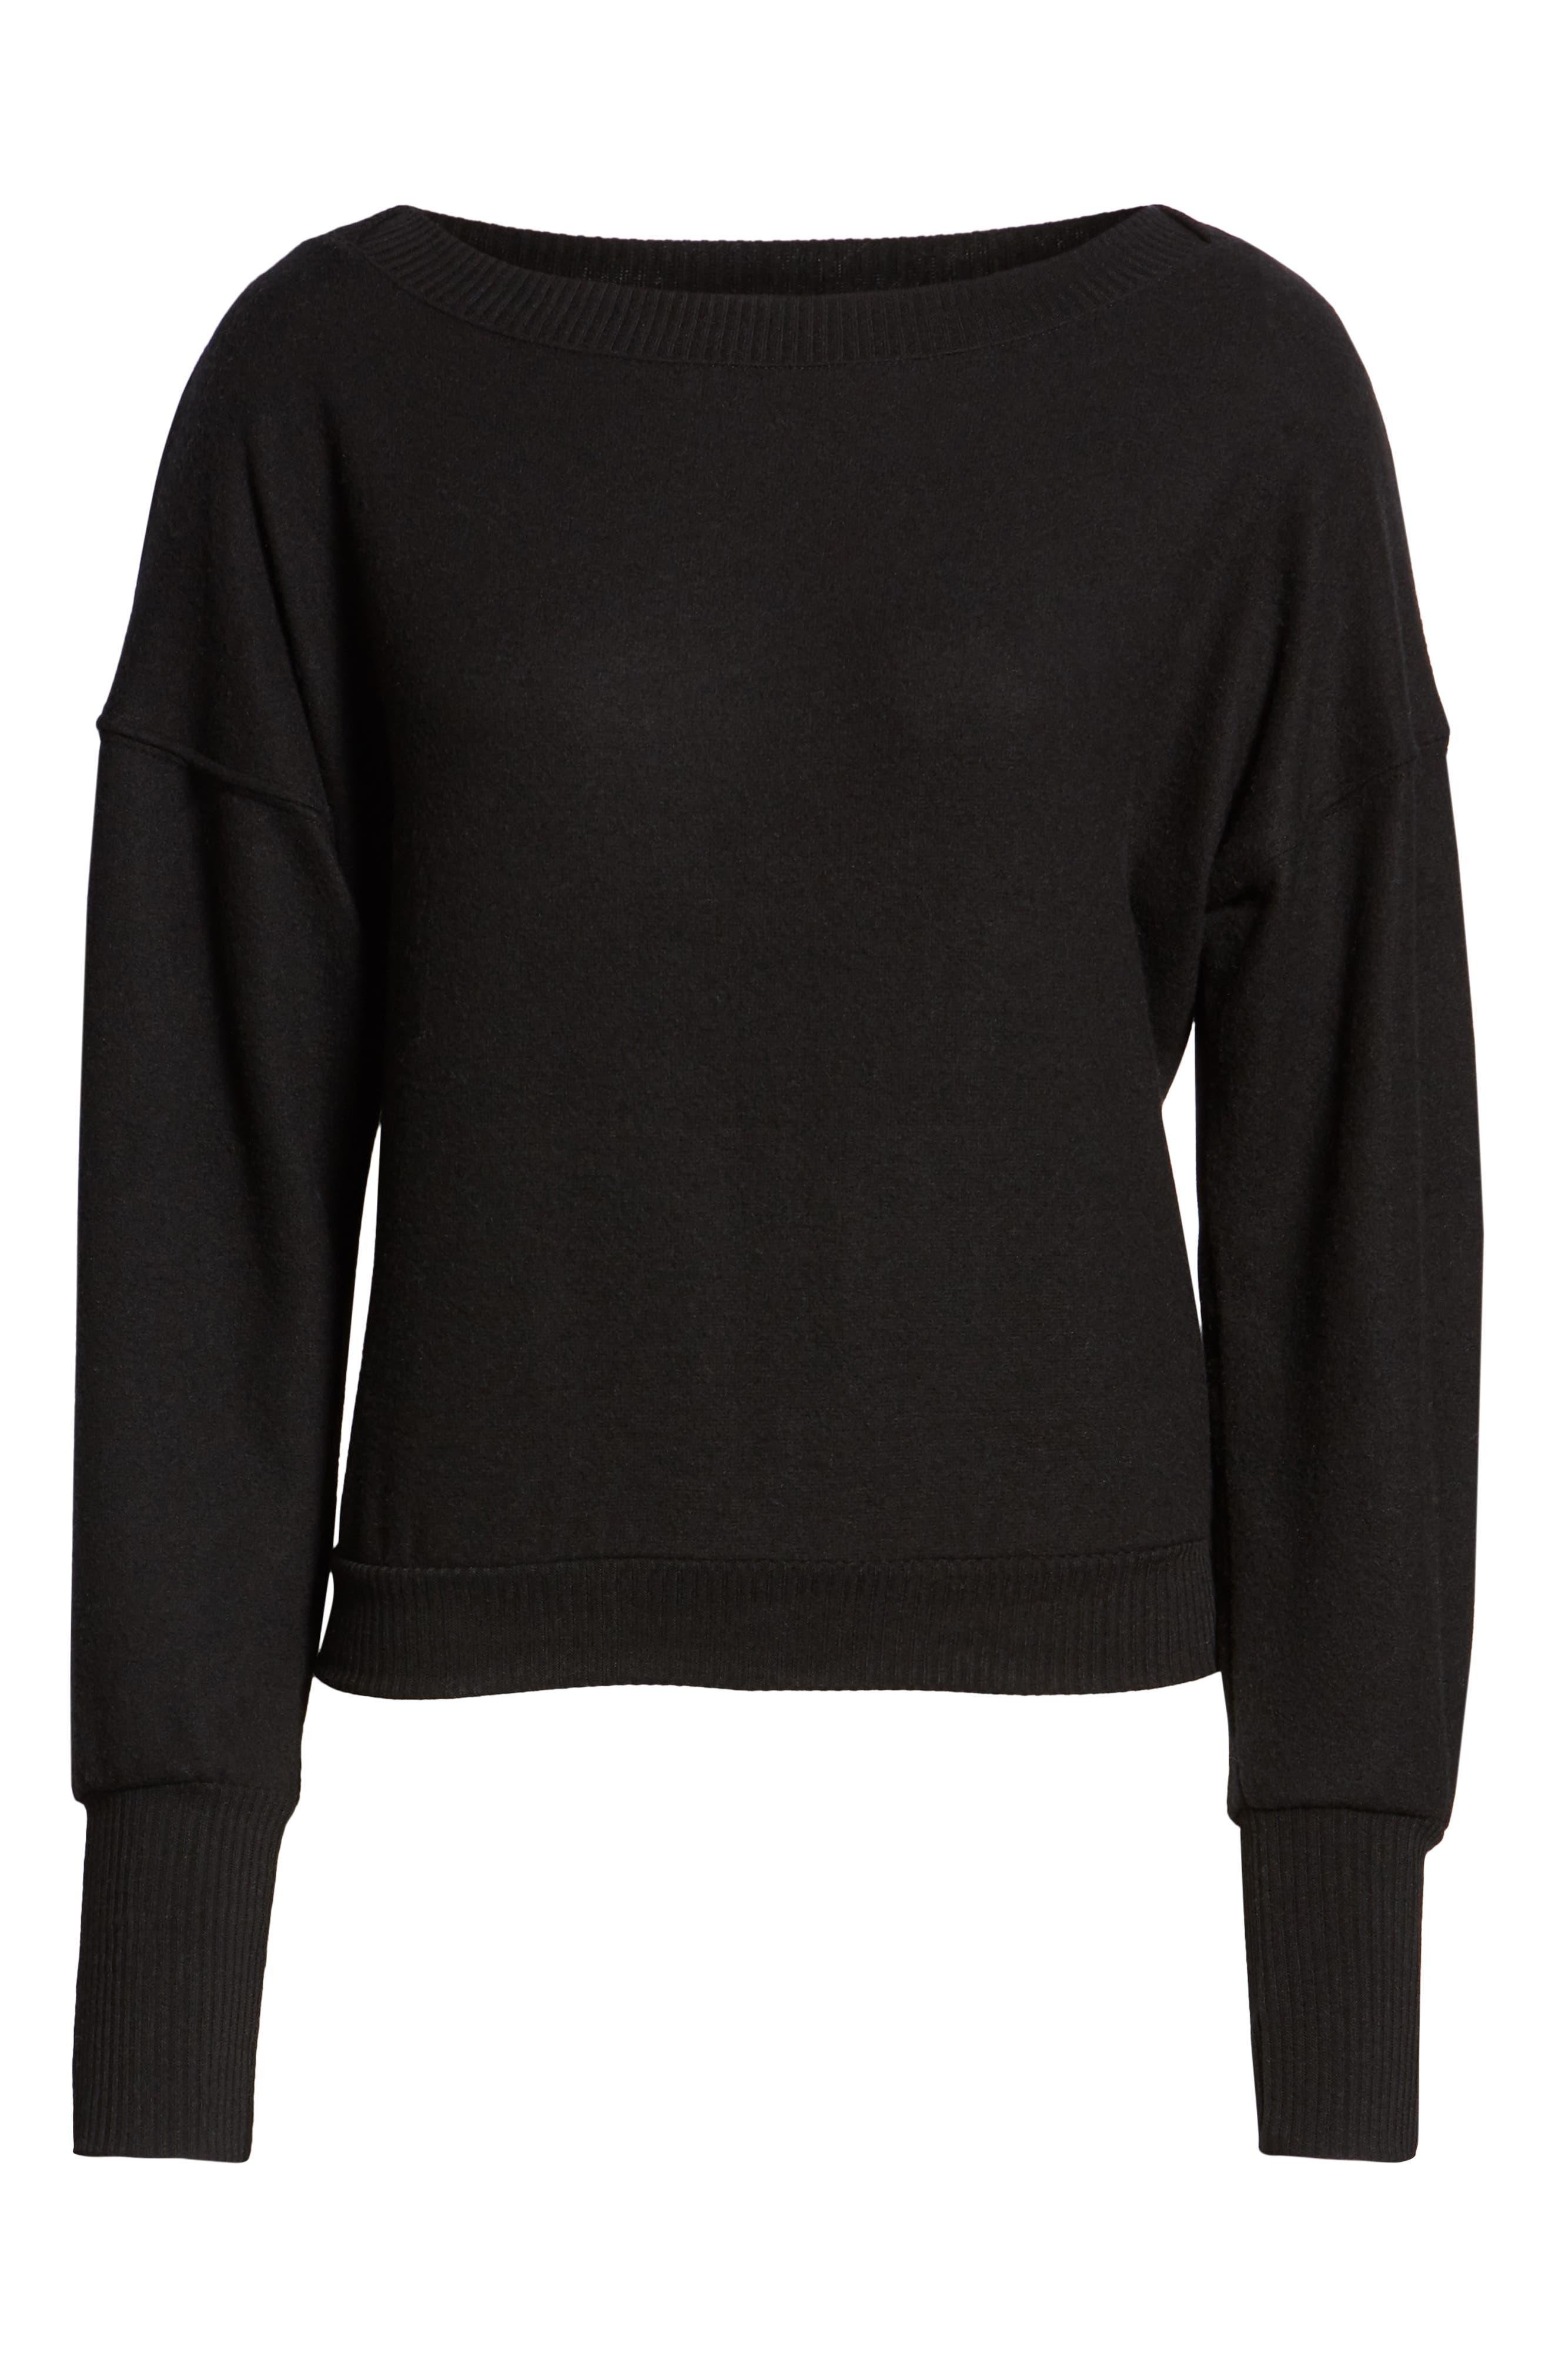 Darwin Cozy Sweatshirt,                             Alternate thumbnail 6, color,                             BLACK